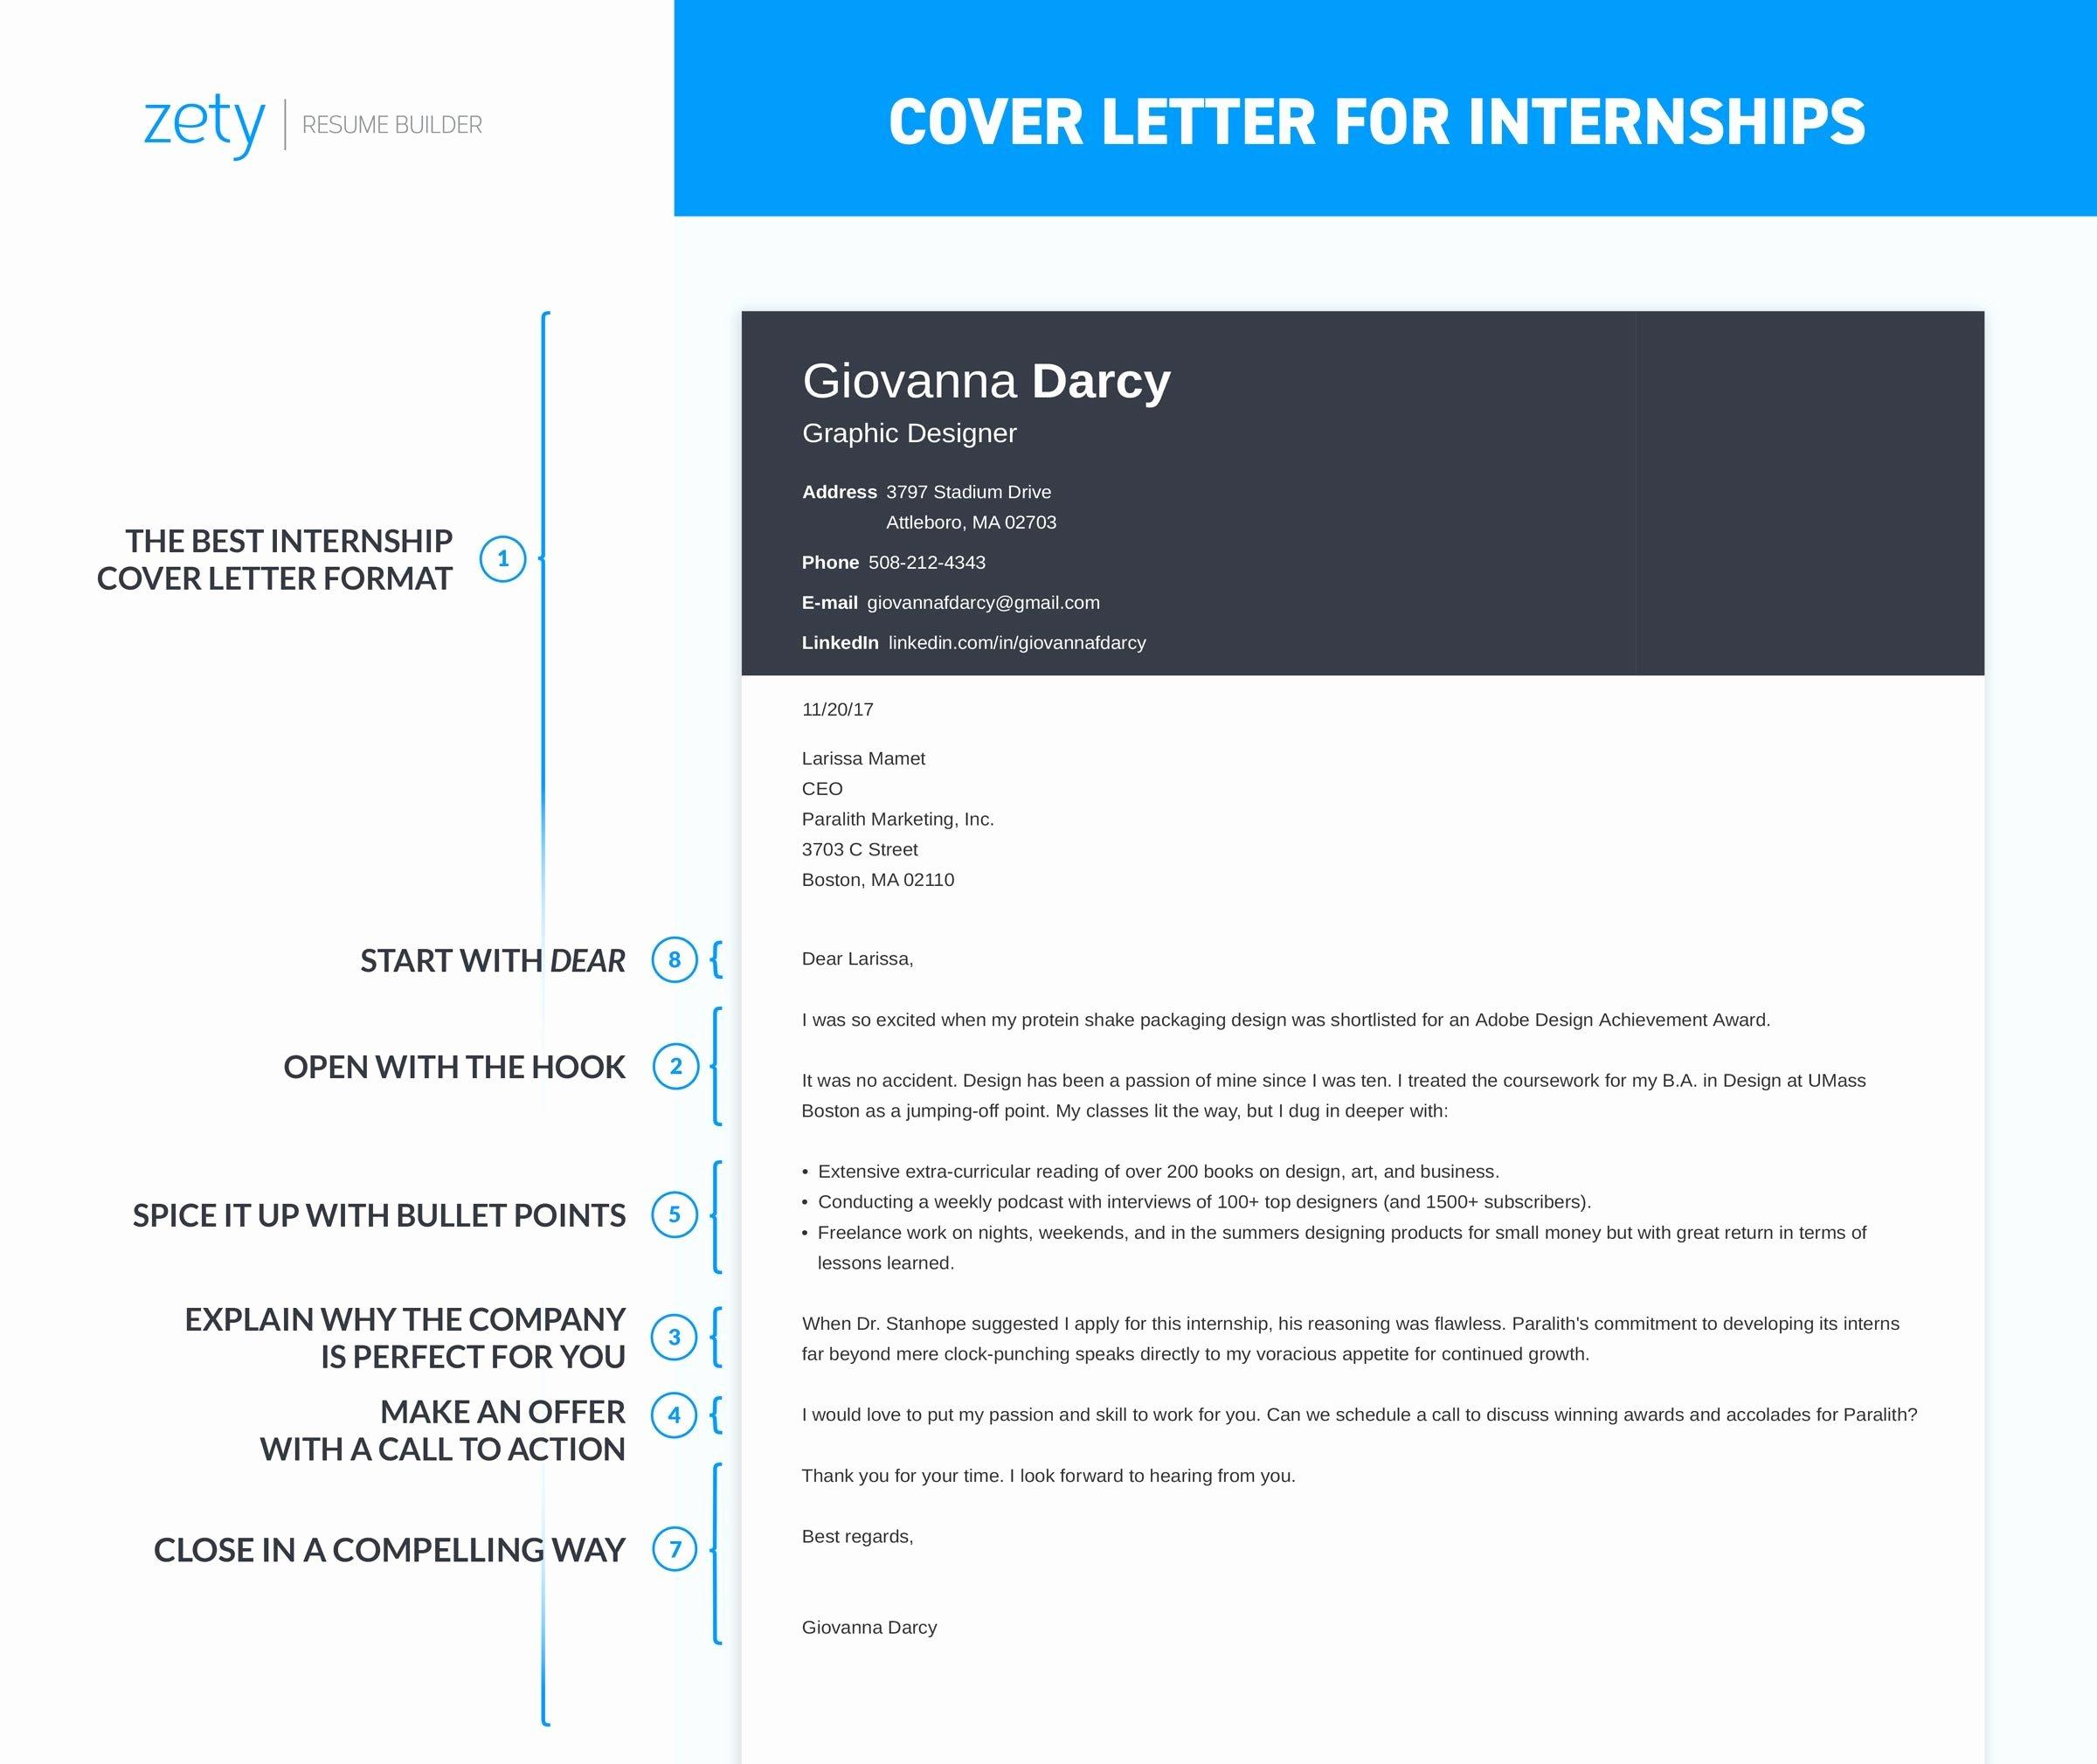 Cover Letter format for Internship Best Of How to Write A Cover Letter for An Internship [ 20 Examples]